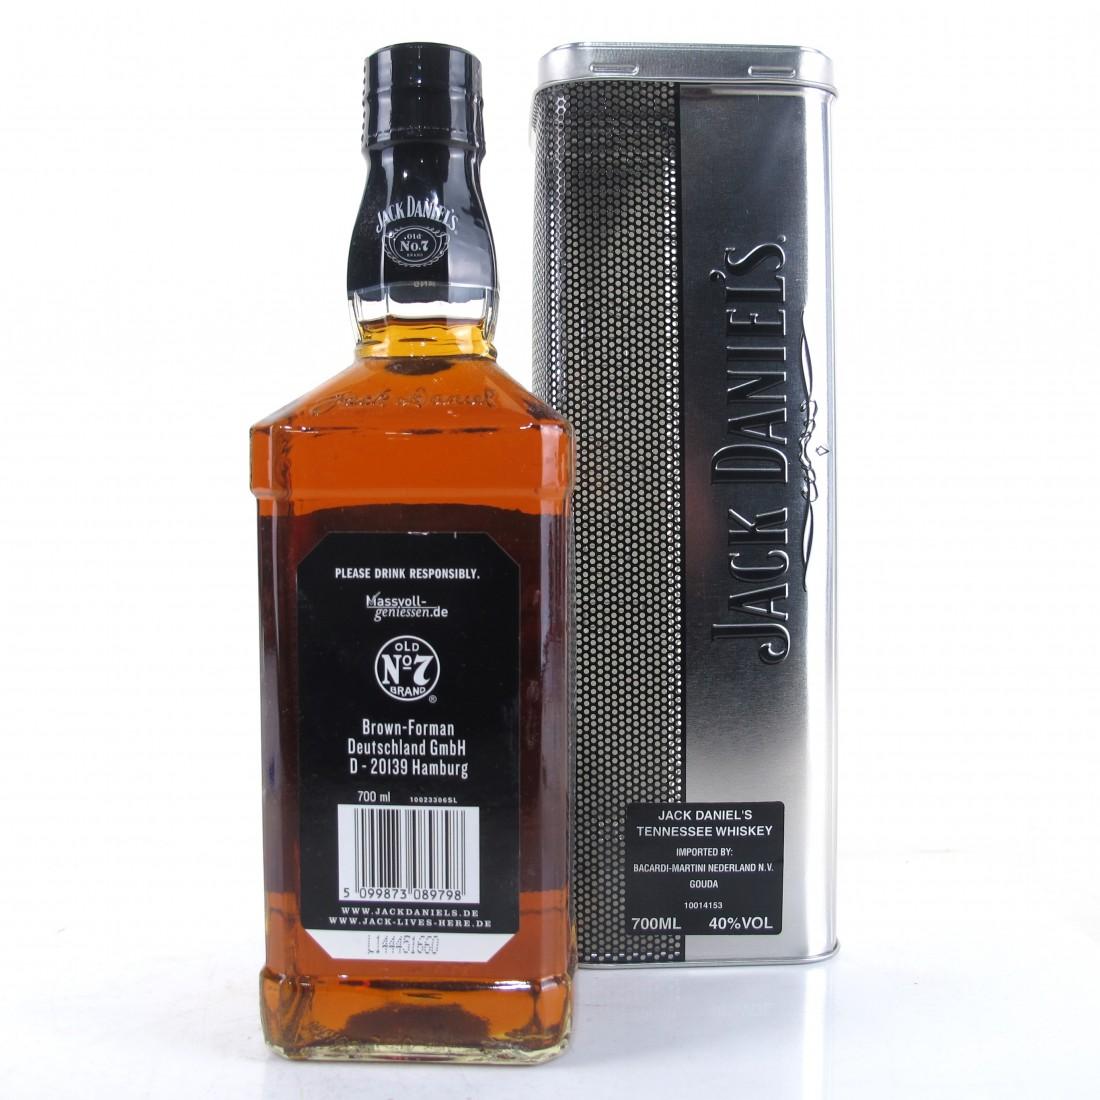 Jack Daniel's Old No.7